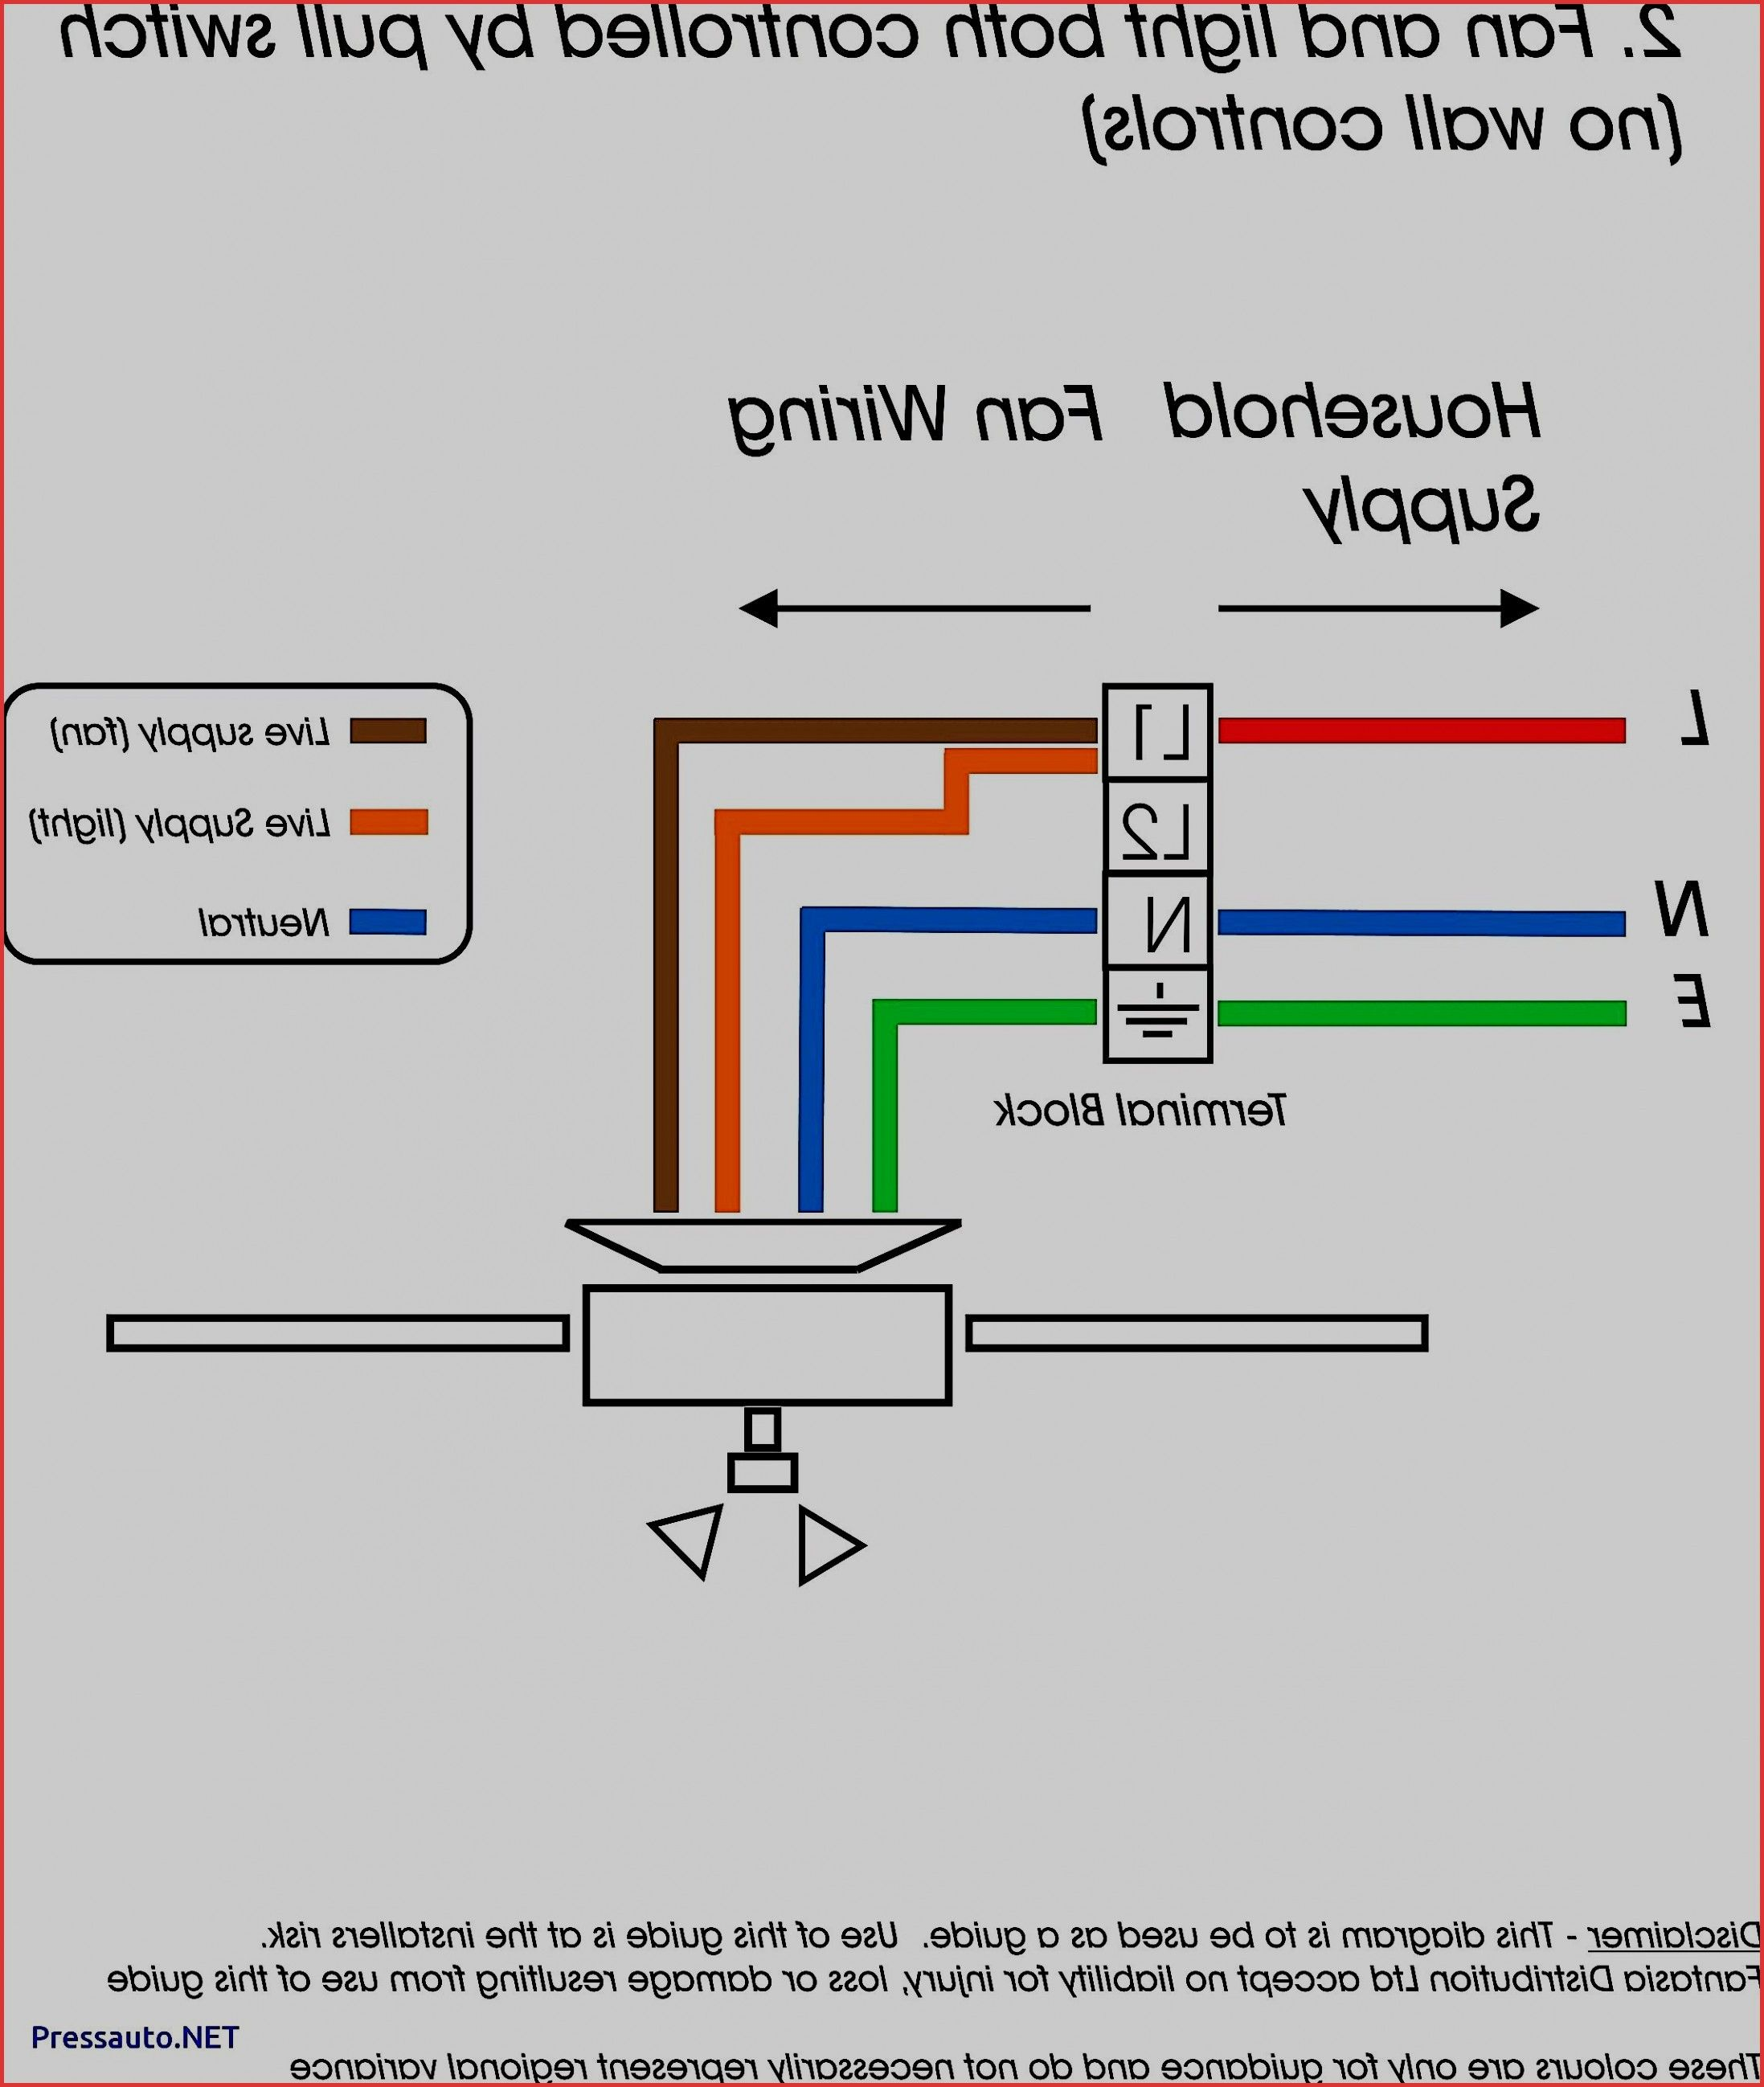 New 1999 Dodge Ram 1500 Tail Light Wiring Diagram Ceiling Fan Wiring Ceiling Fan Switch Electrical Wiring Diagram